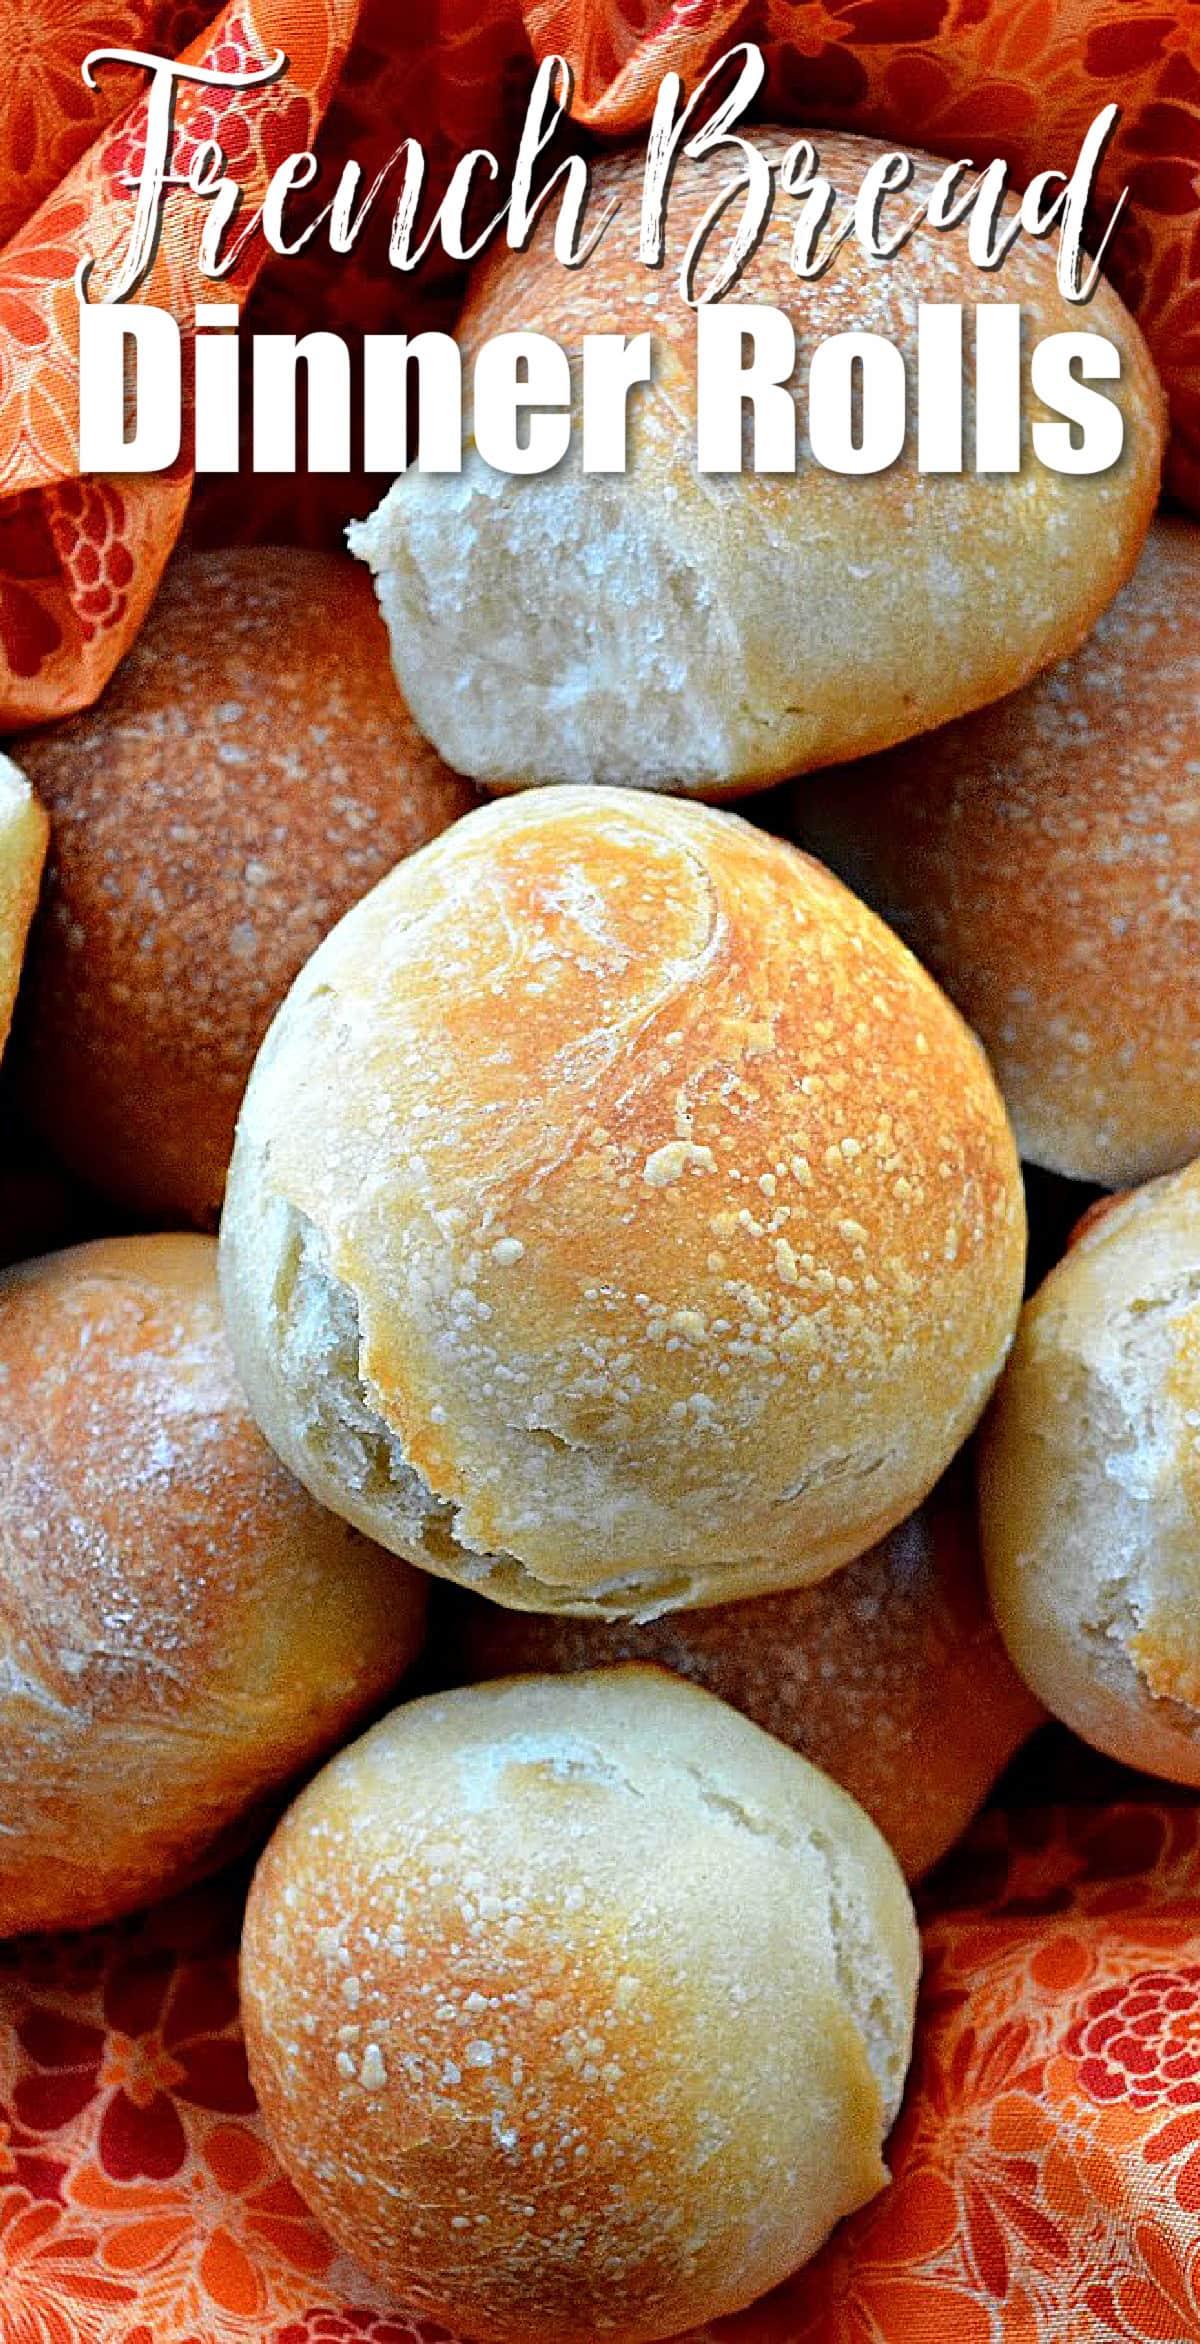 A basket full of French Bread Dinner Rolls with white text at the top French Bread Dinner Rolls.